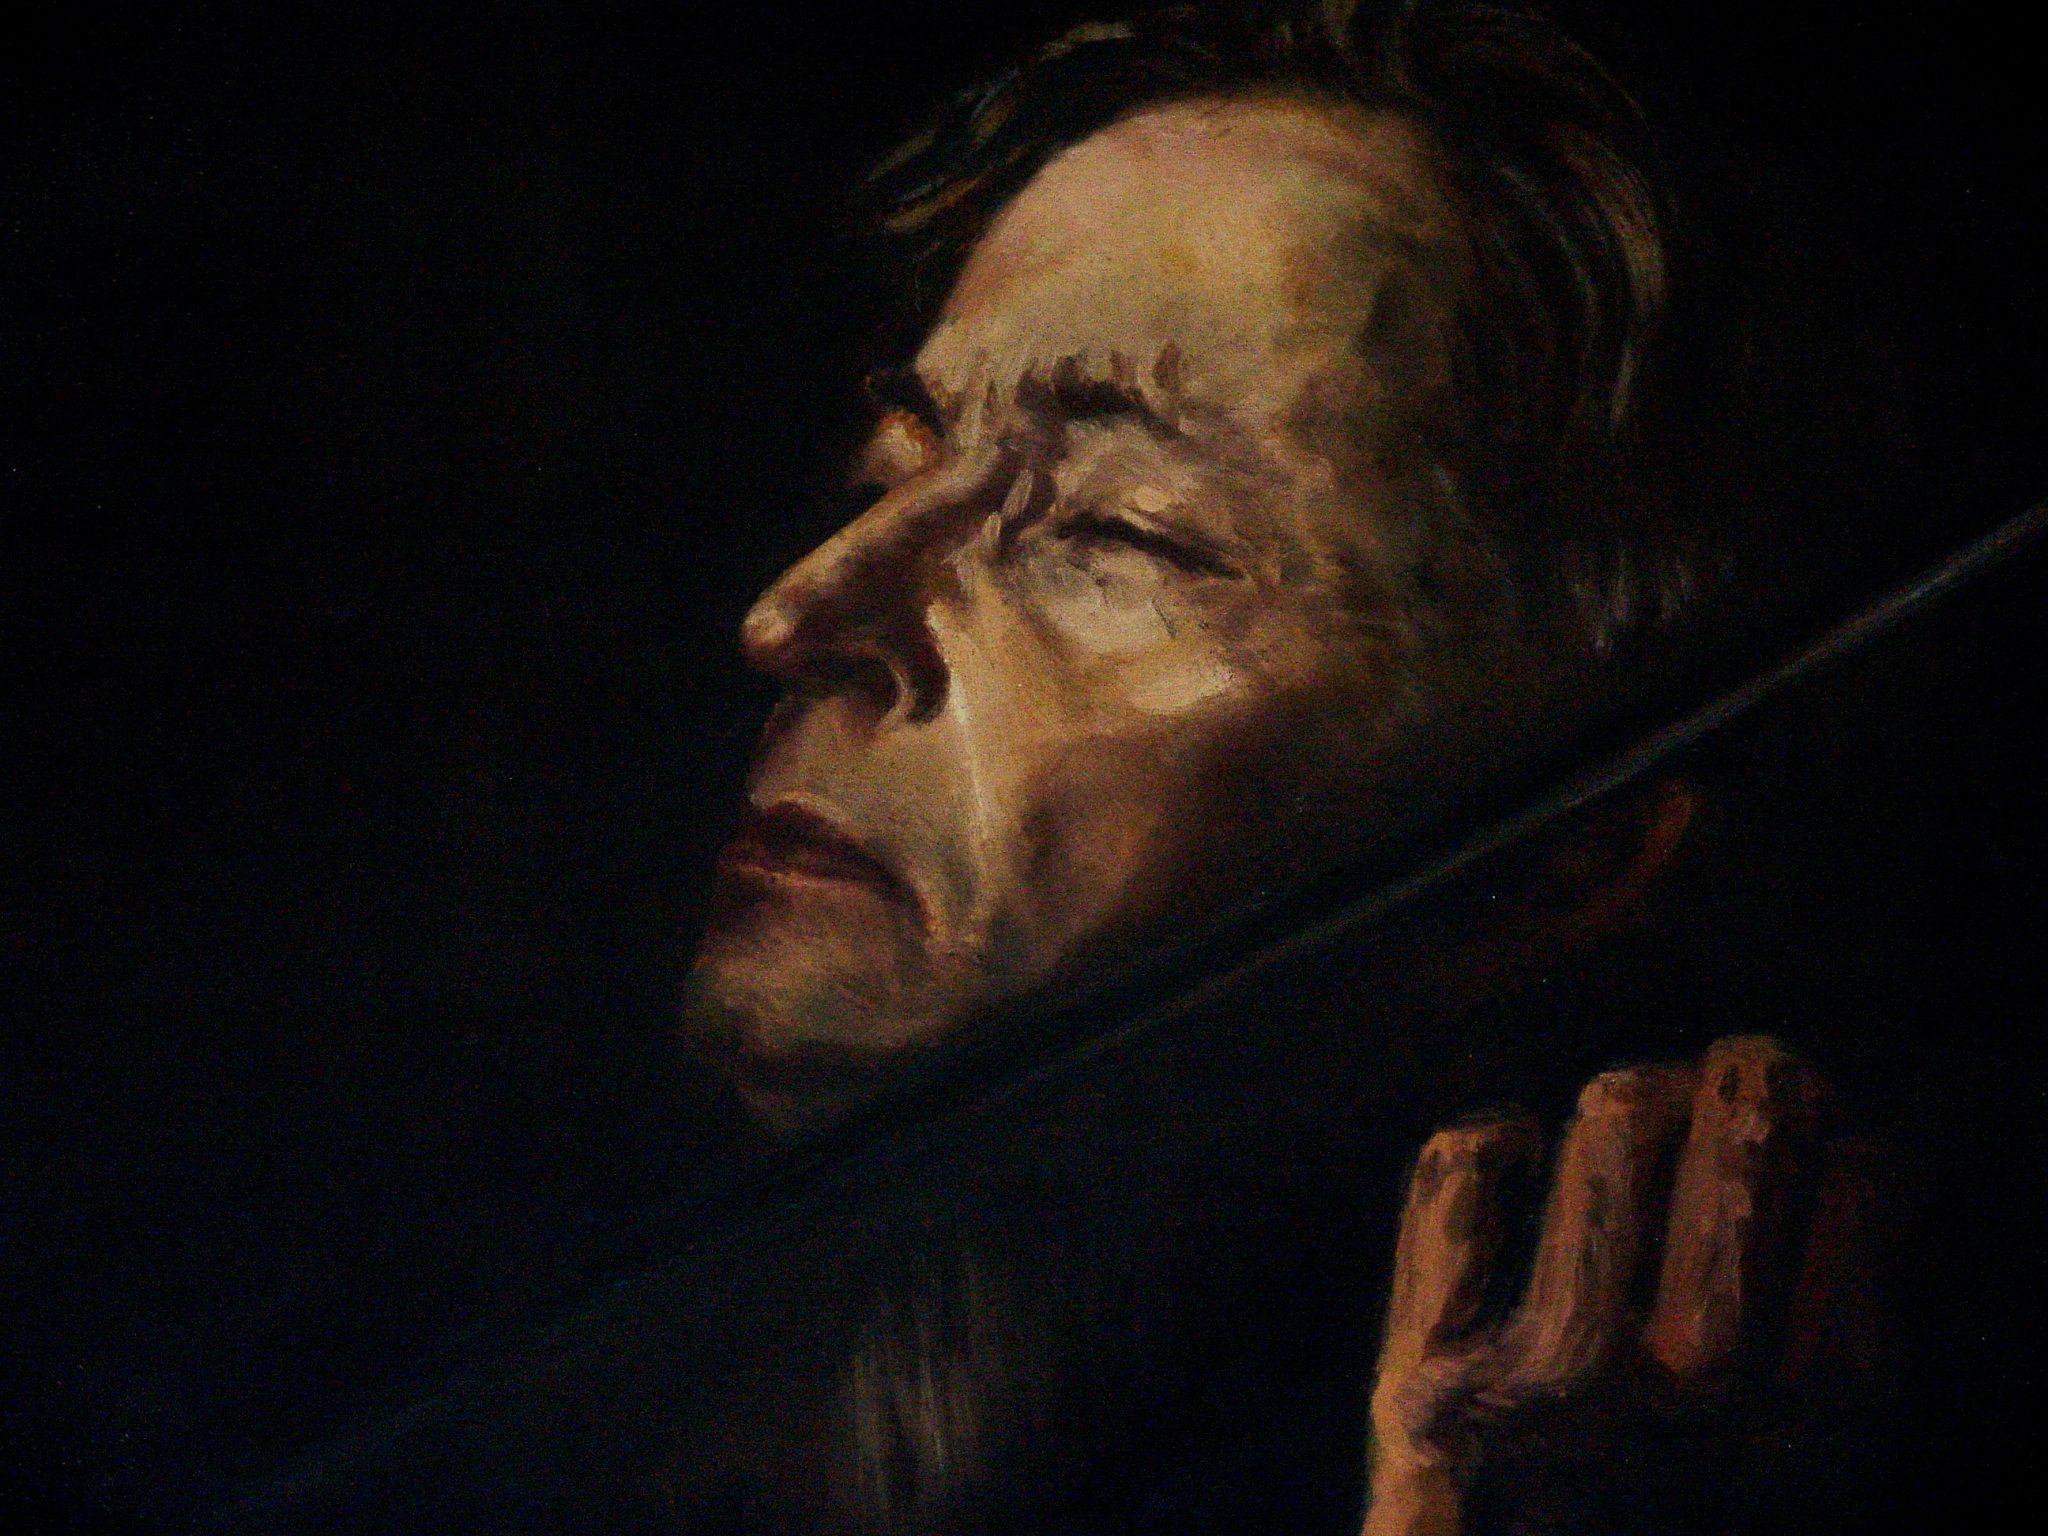 "Tablou_George_Enescu_-_Muzeul_""George_Enescu-_din_Dorohoi DSC_0264"